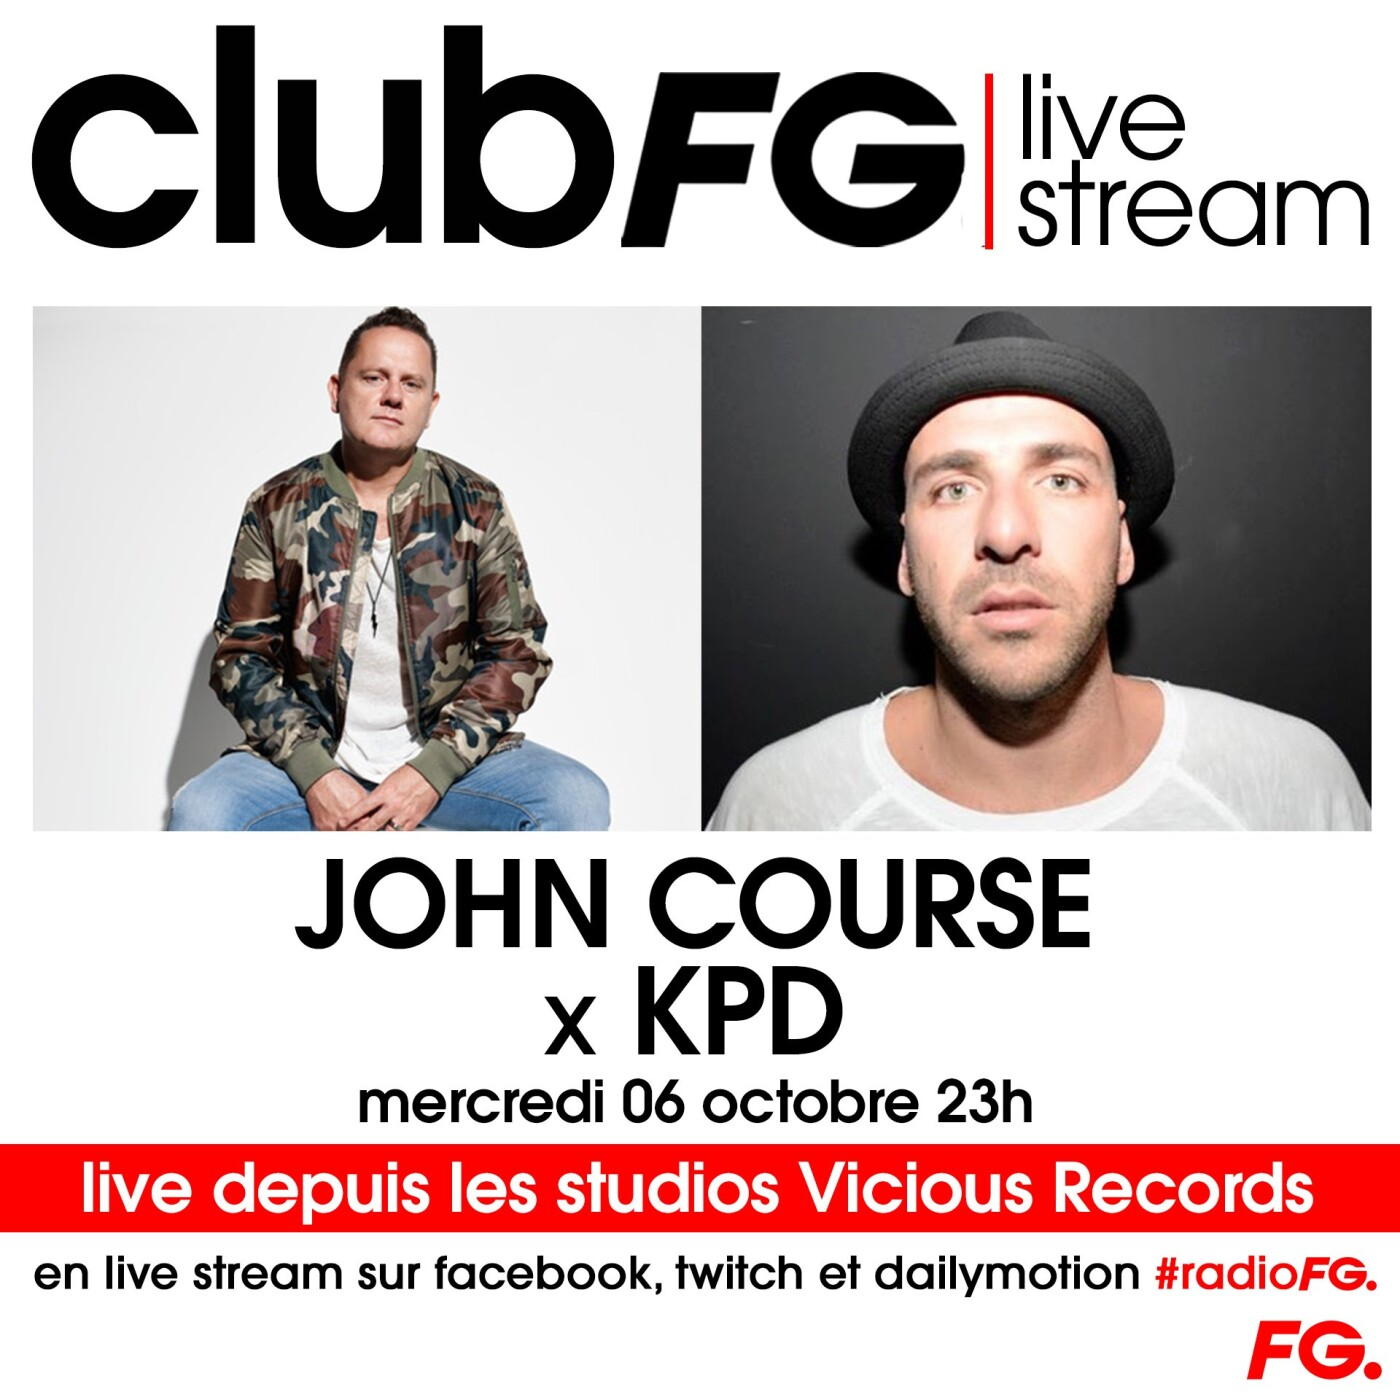 CLUB FG LIVE STREAM : JOHN COURSE x KPD